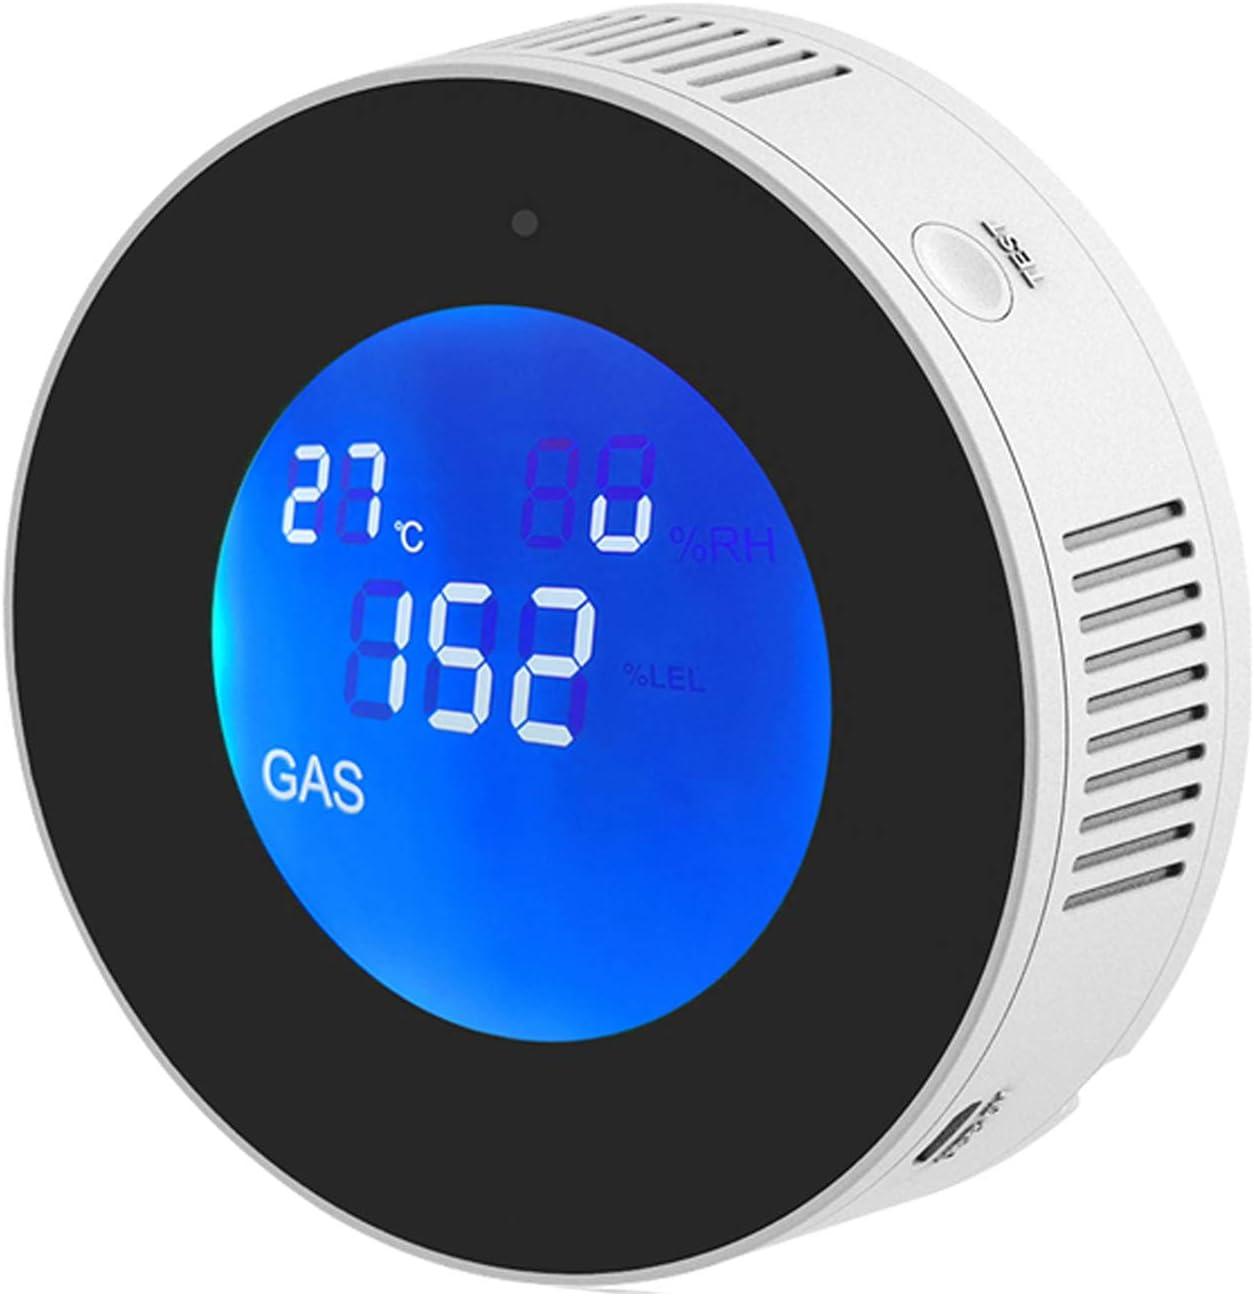 Natural Gas Detector & Propane Detector , Smart WiFi Gas Leak Detector for Home, Kitchen. Plug-in Gas Leak Sensor for LPG, LNG, Methane & Butane Gases, APP Control LCD Display Temperature Sensor.